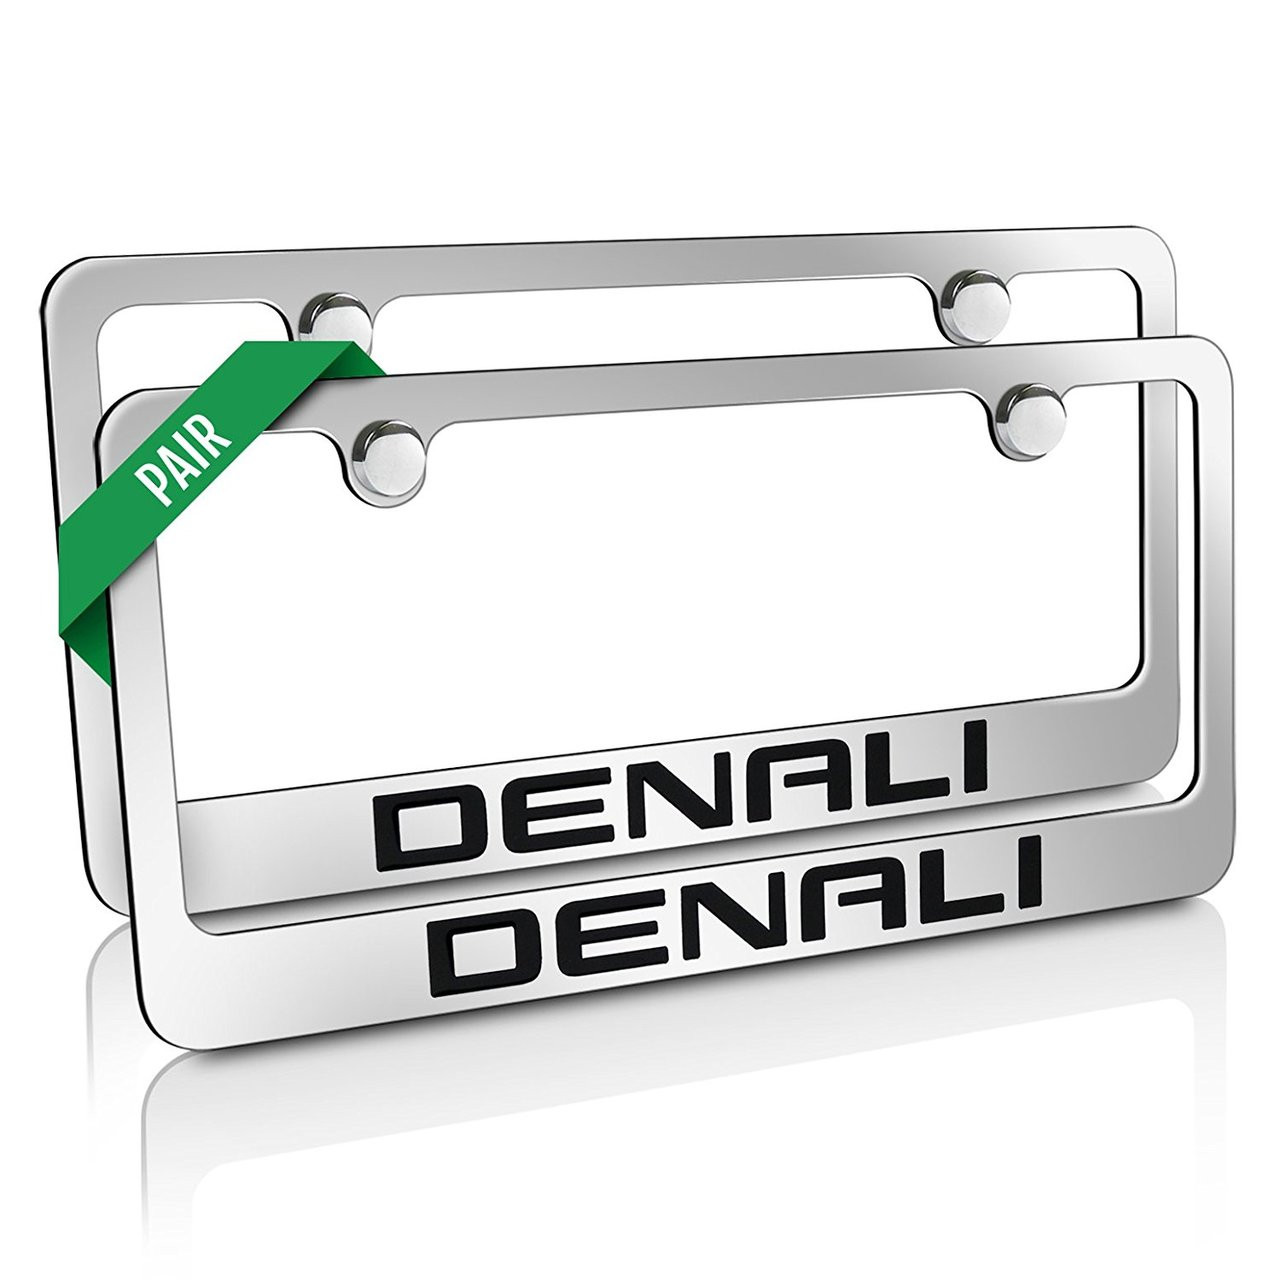 GMC Denali Chrome Metal License Plate Frames pair - Car Beyond Store